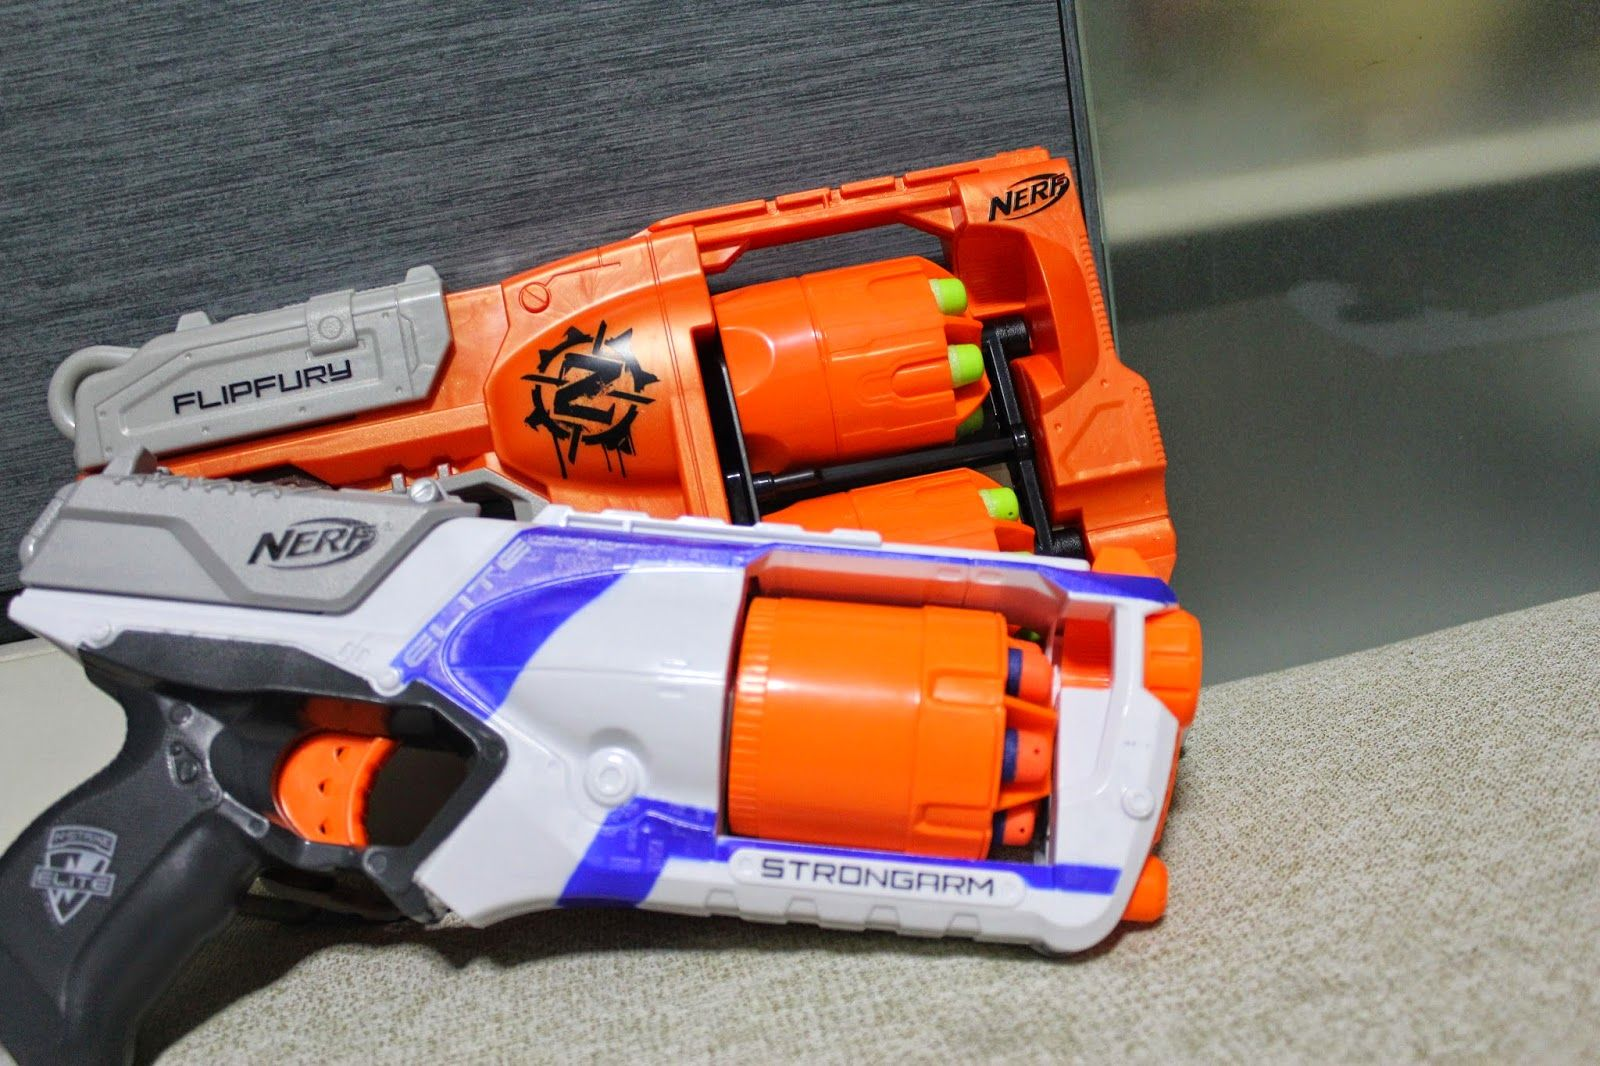 Blaze Storm Battery Operated Cartridge Dart Gun